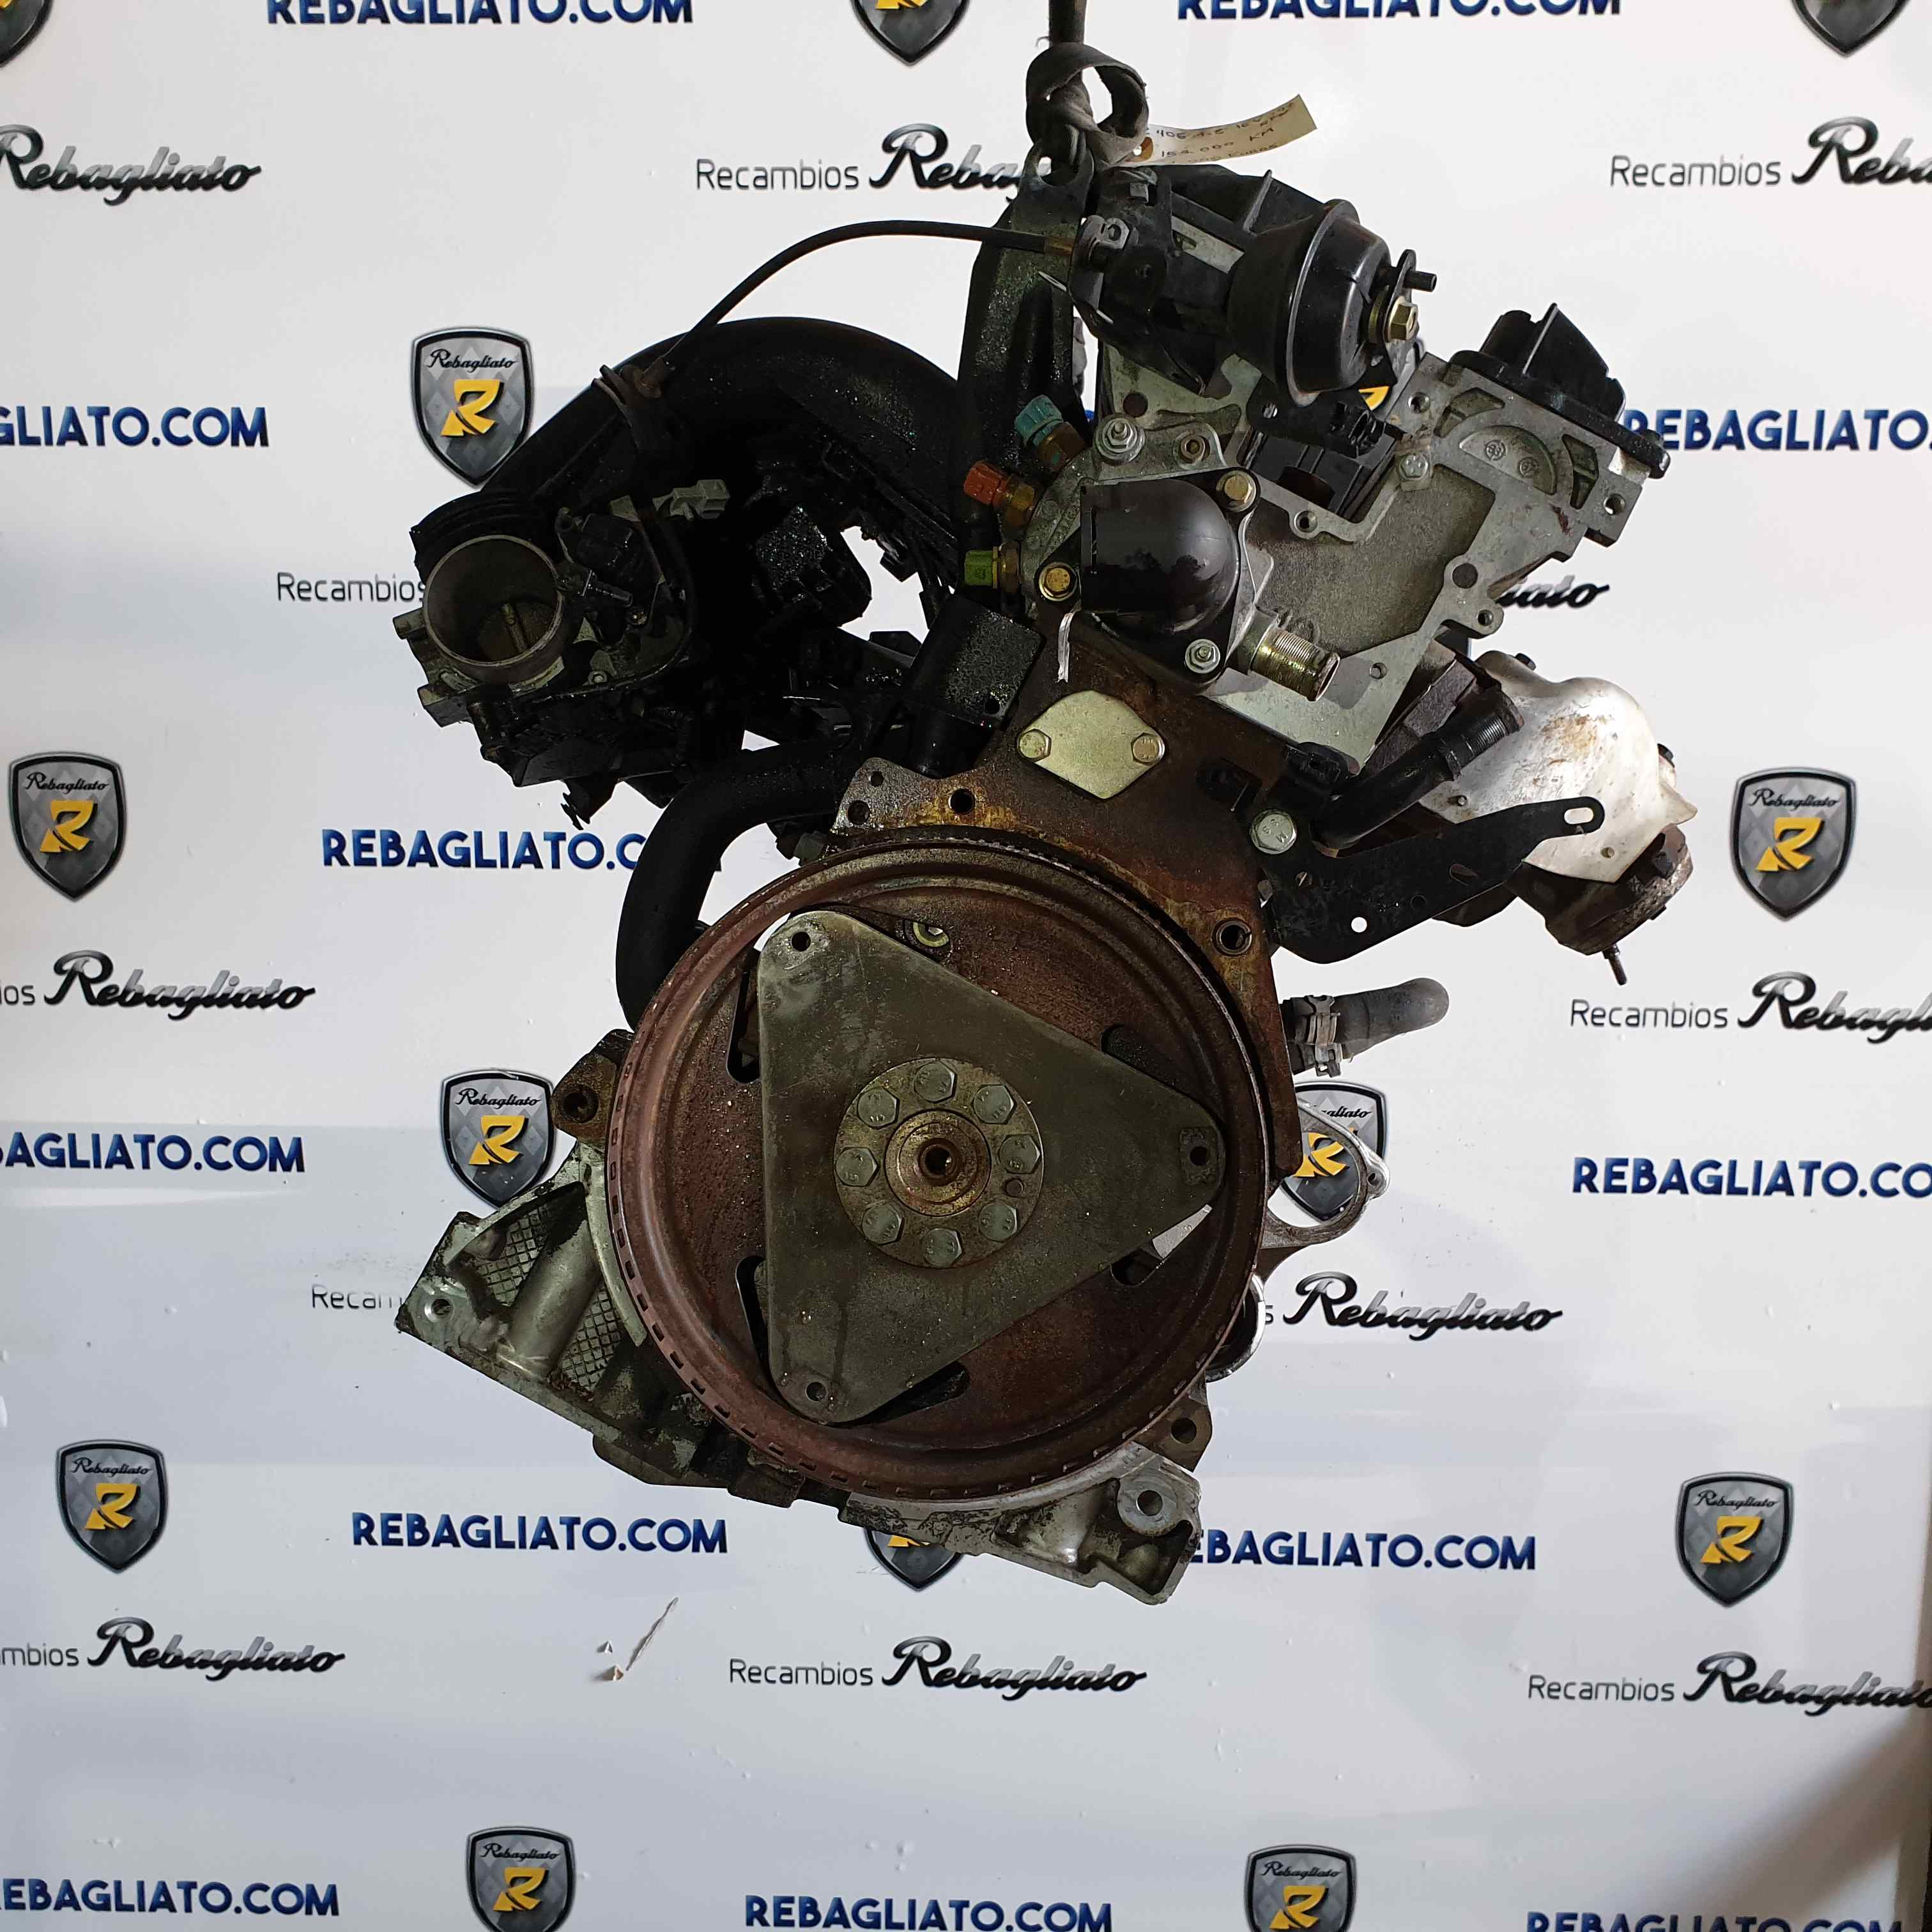 Motor completo de Peugeot 406 berlina (s1/s2) (1995 - 2005) RFV